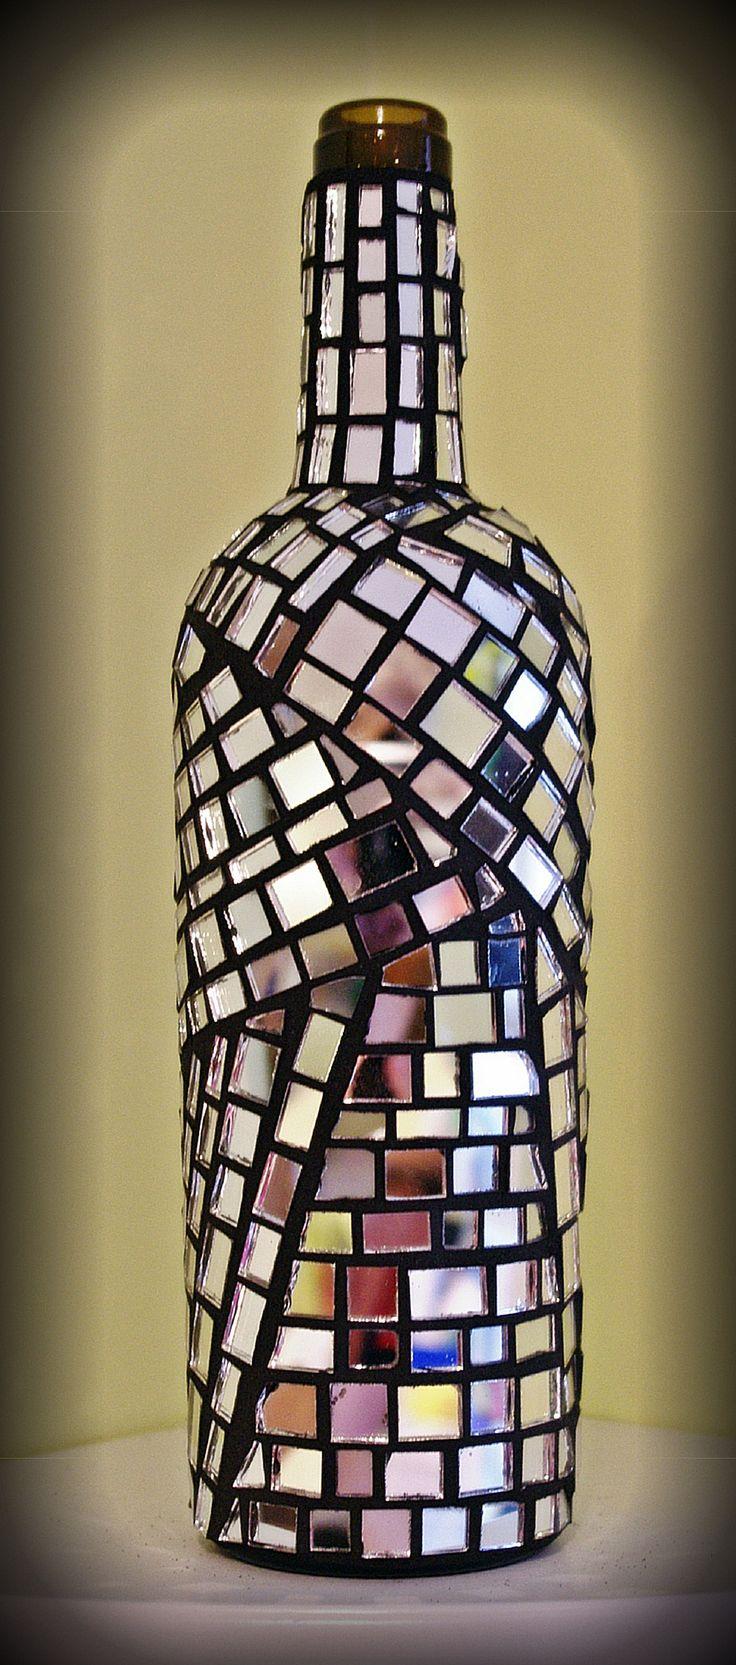 Mirror Mosaic wine bottle | Recycled wine bottle using mirro… | Flickr